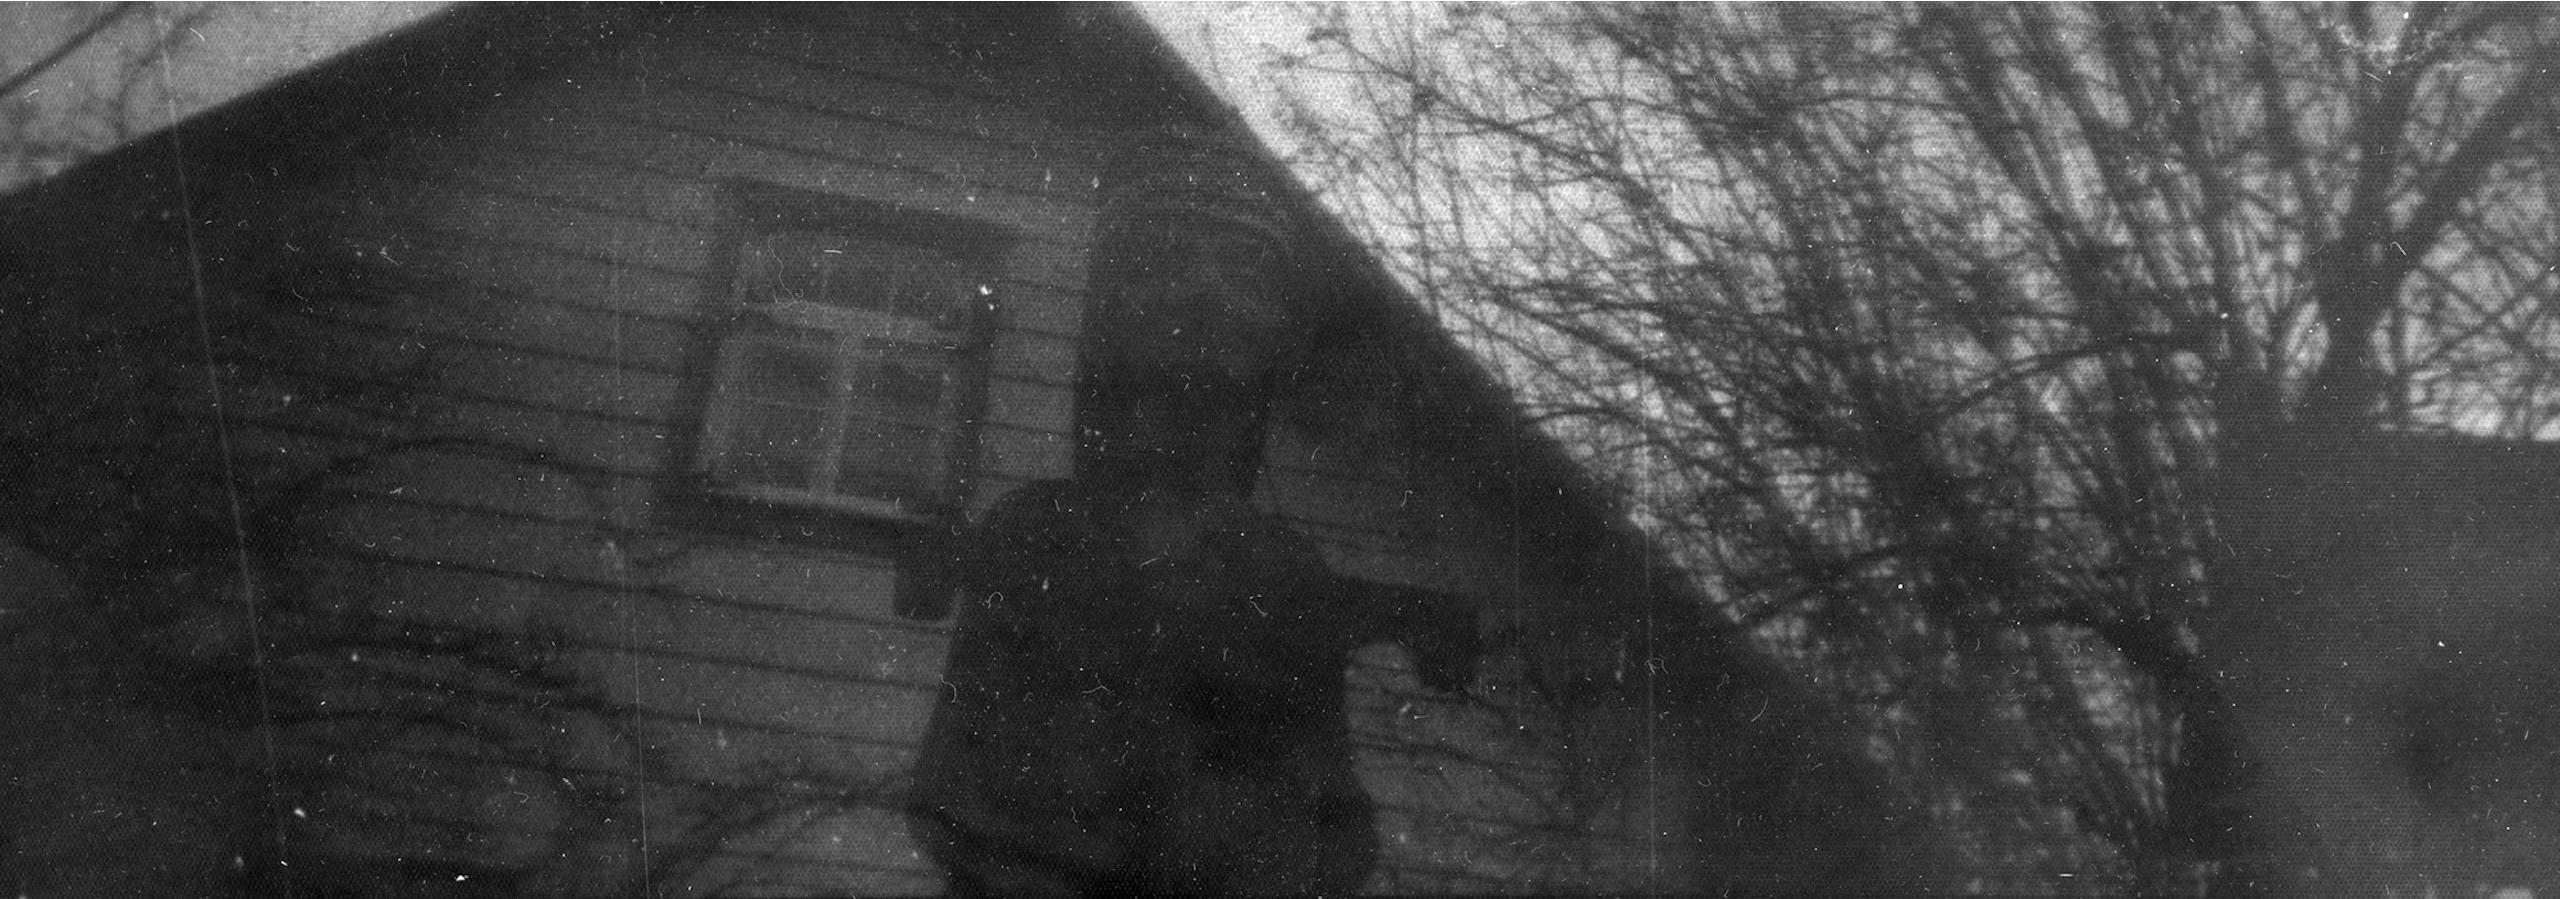 "Jan Kazimierz Barnaś, photo from project ""Returns: Setomaa"", 2020"